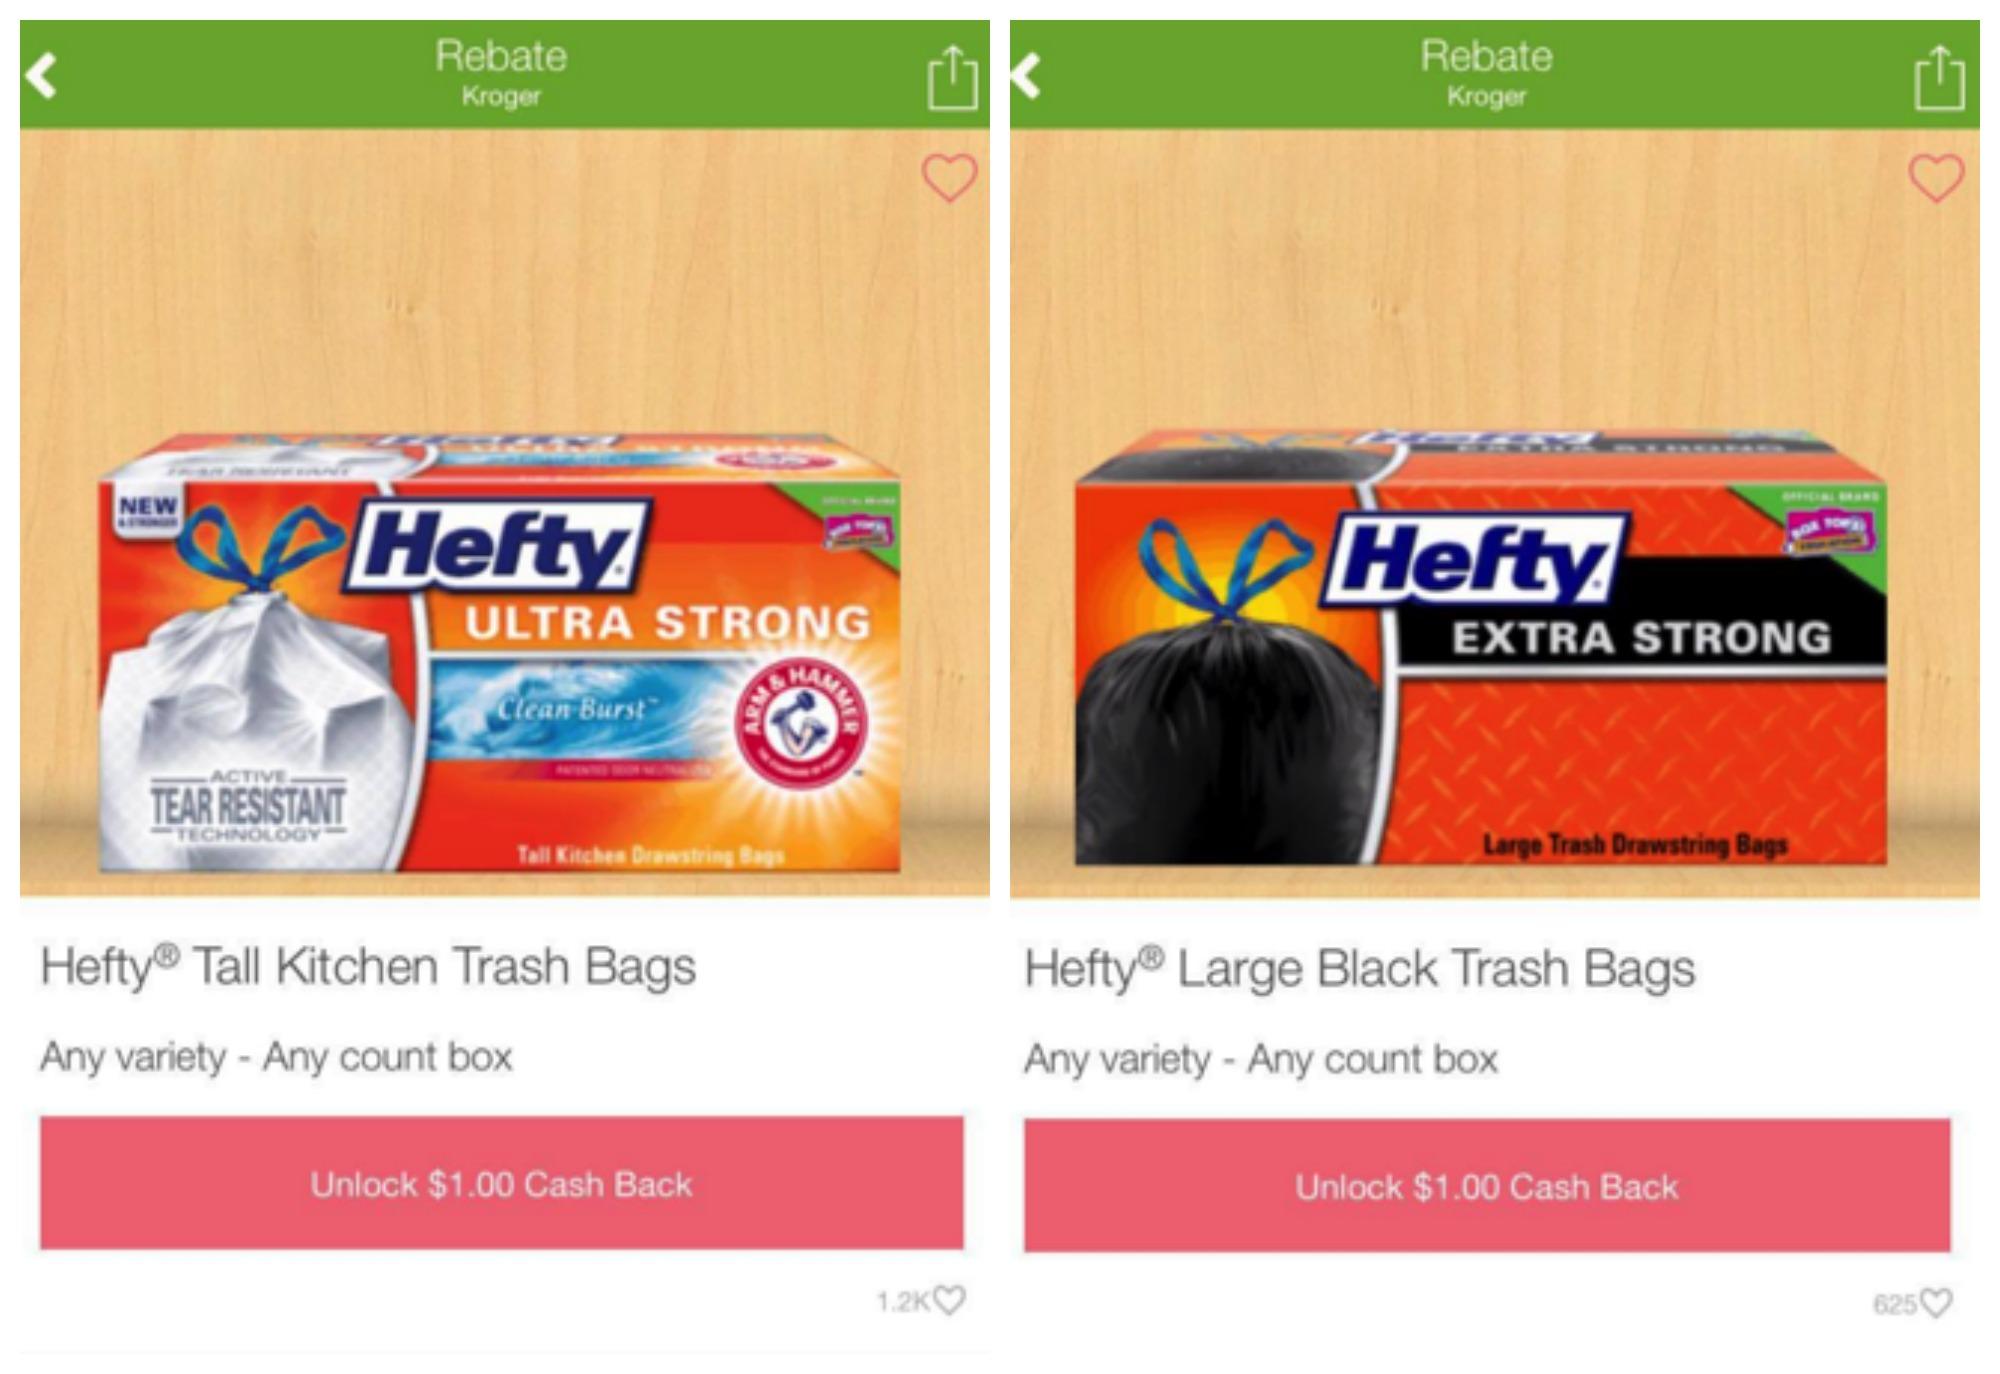 hefty rebates Collage